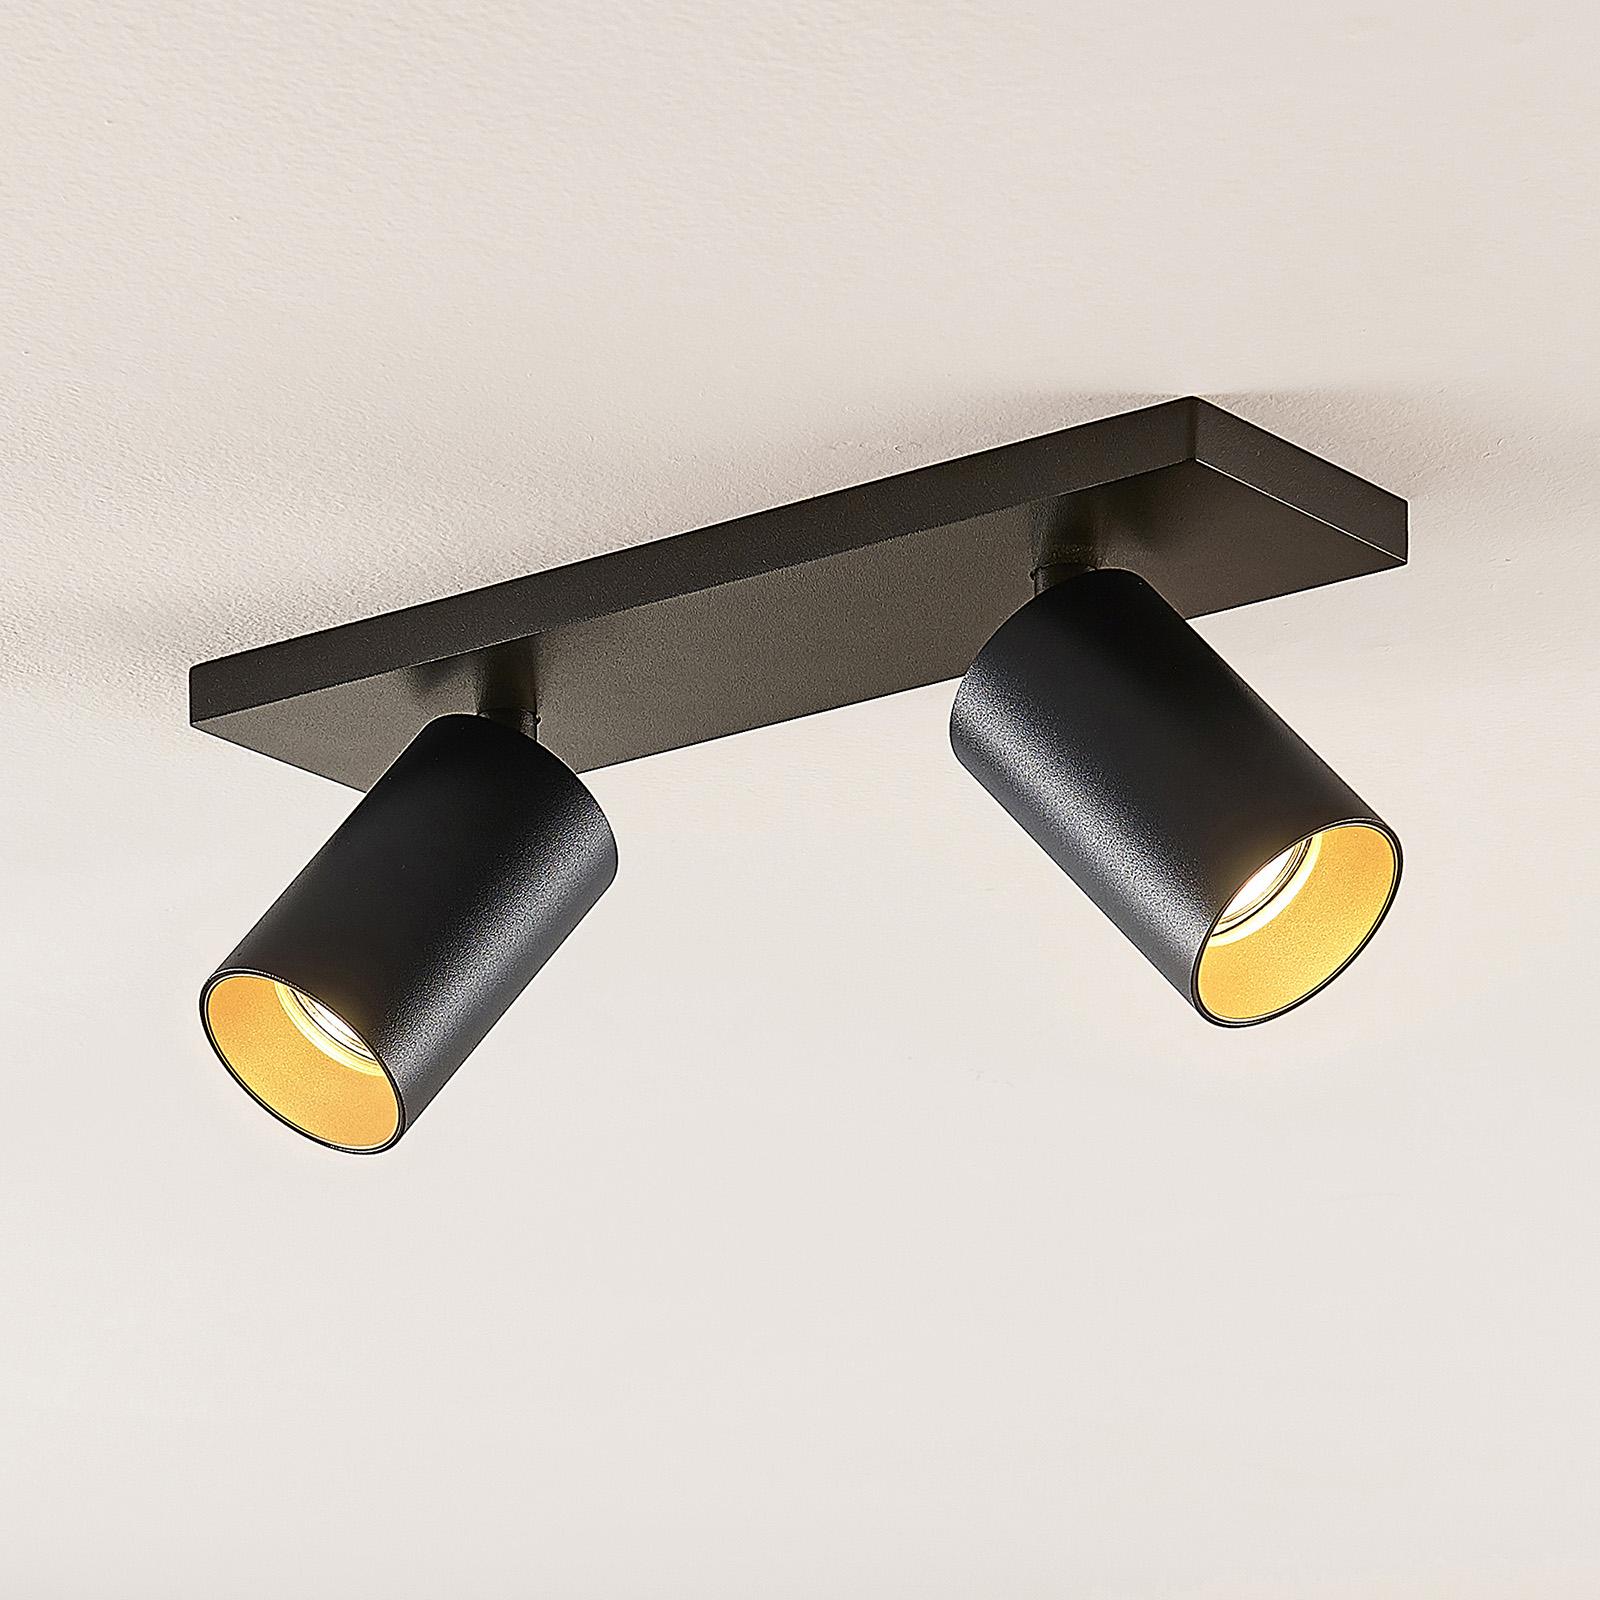 Kohdevalo Brinja GU10 musta 2 lamppua